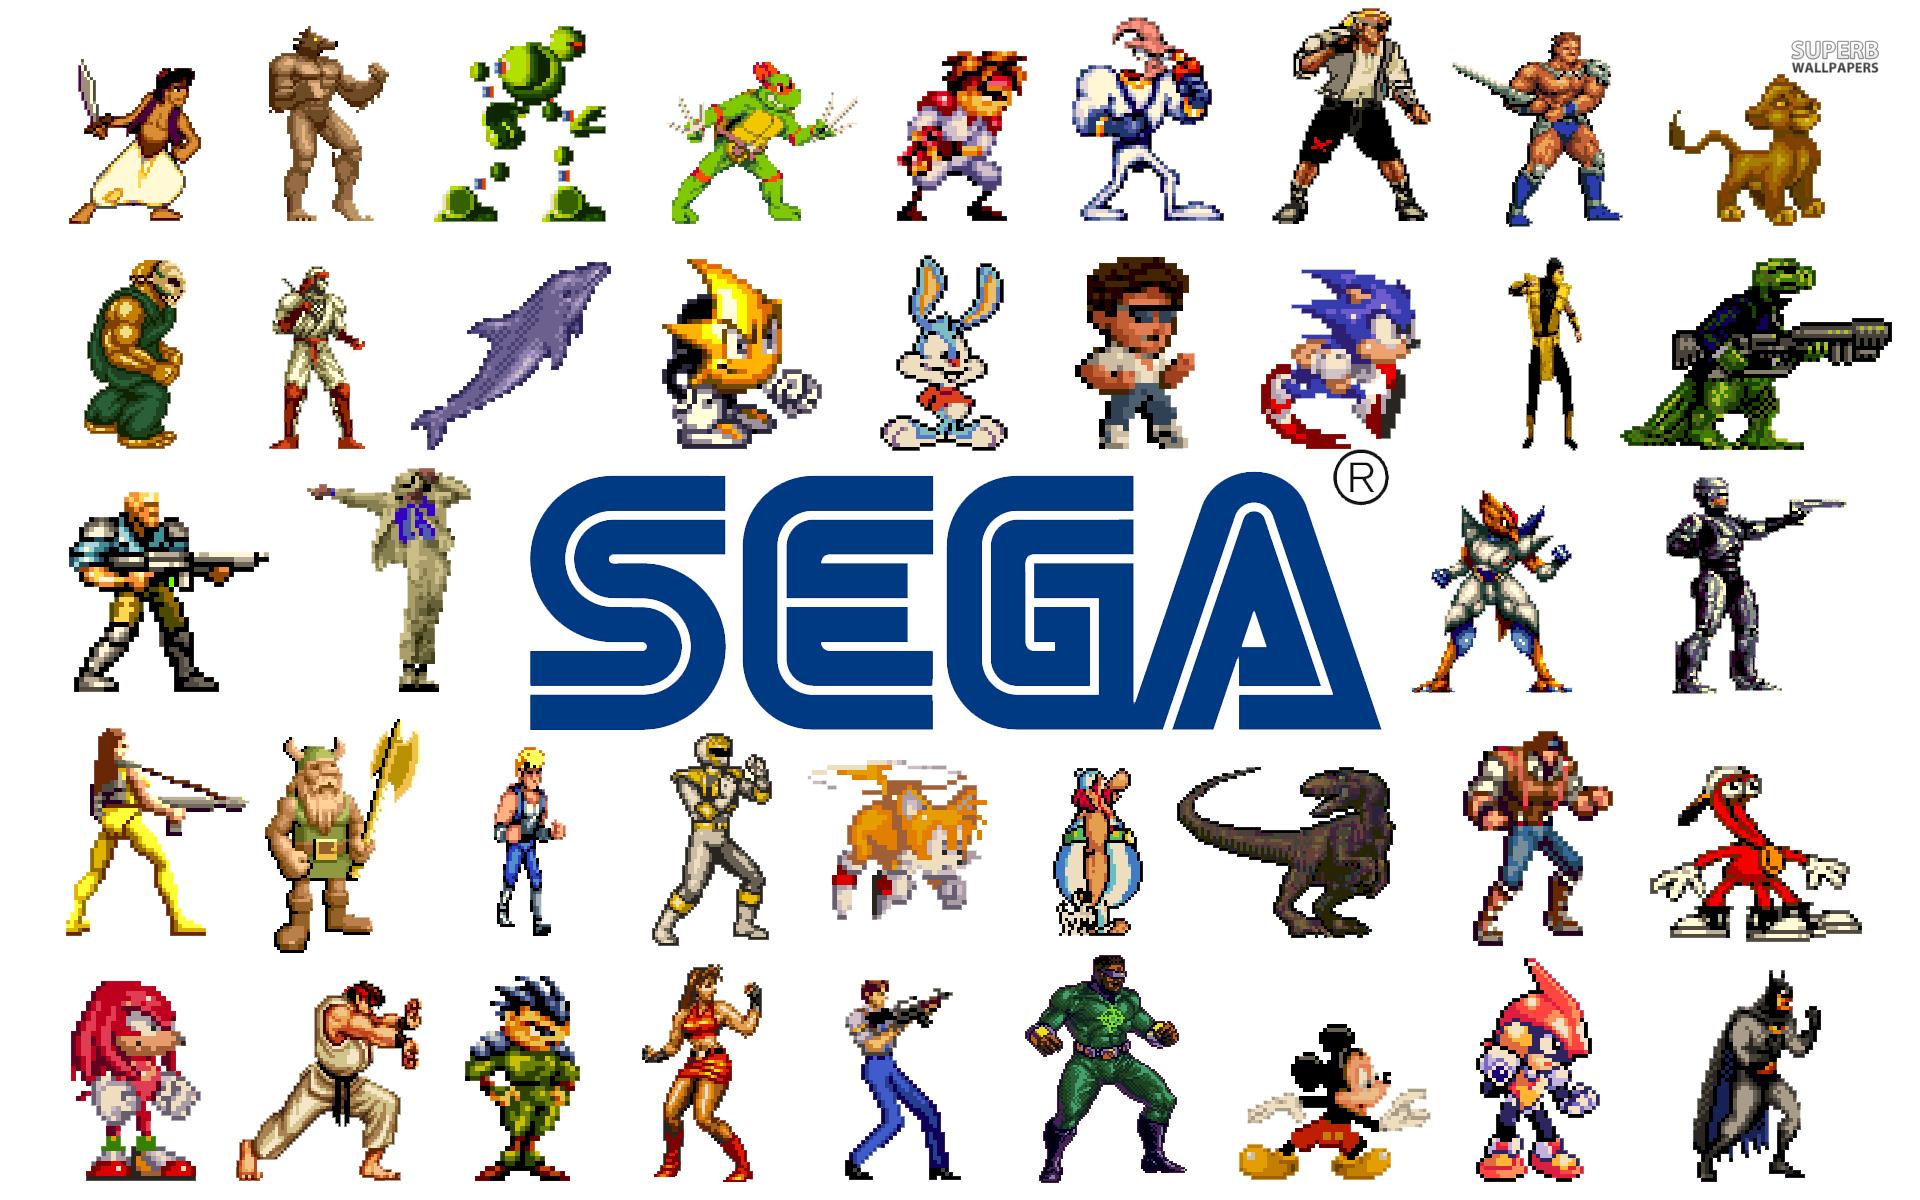 sega-mega-drive-heroes-20046-1920x1200